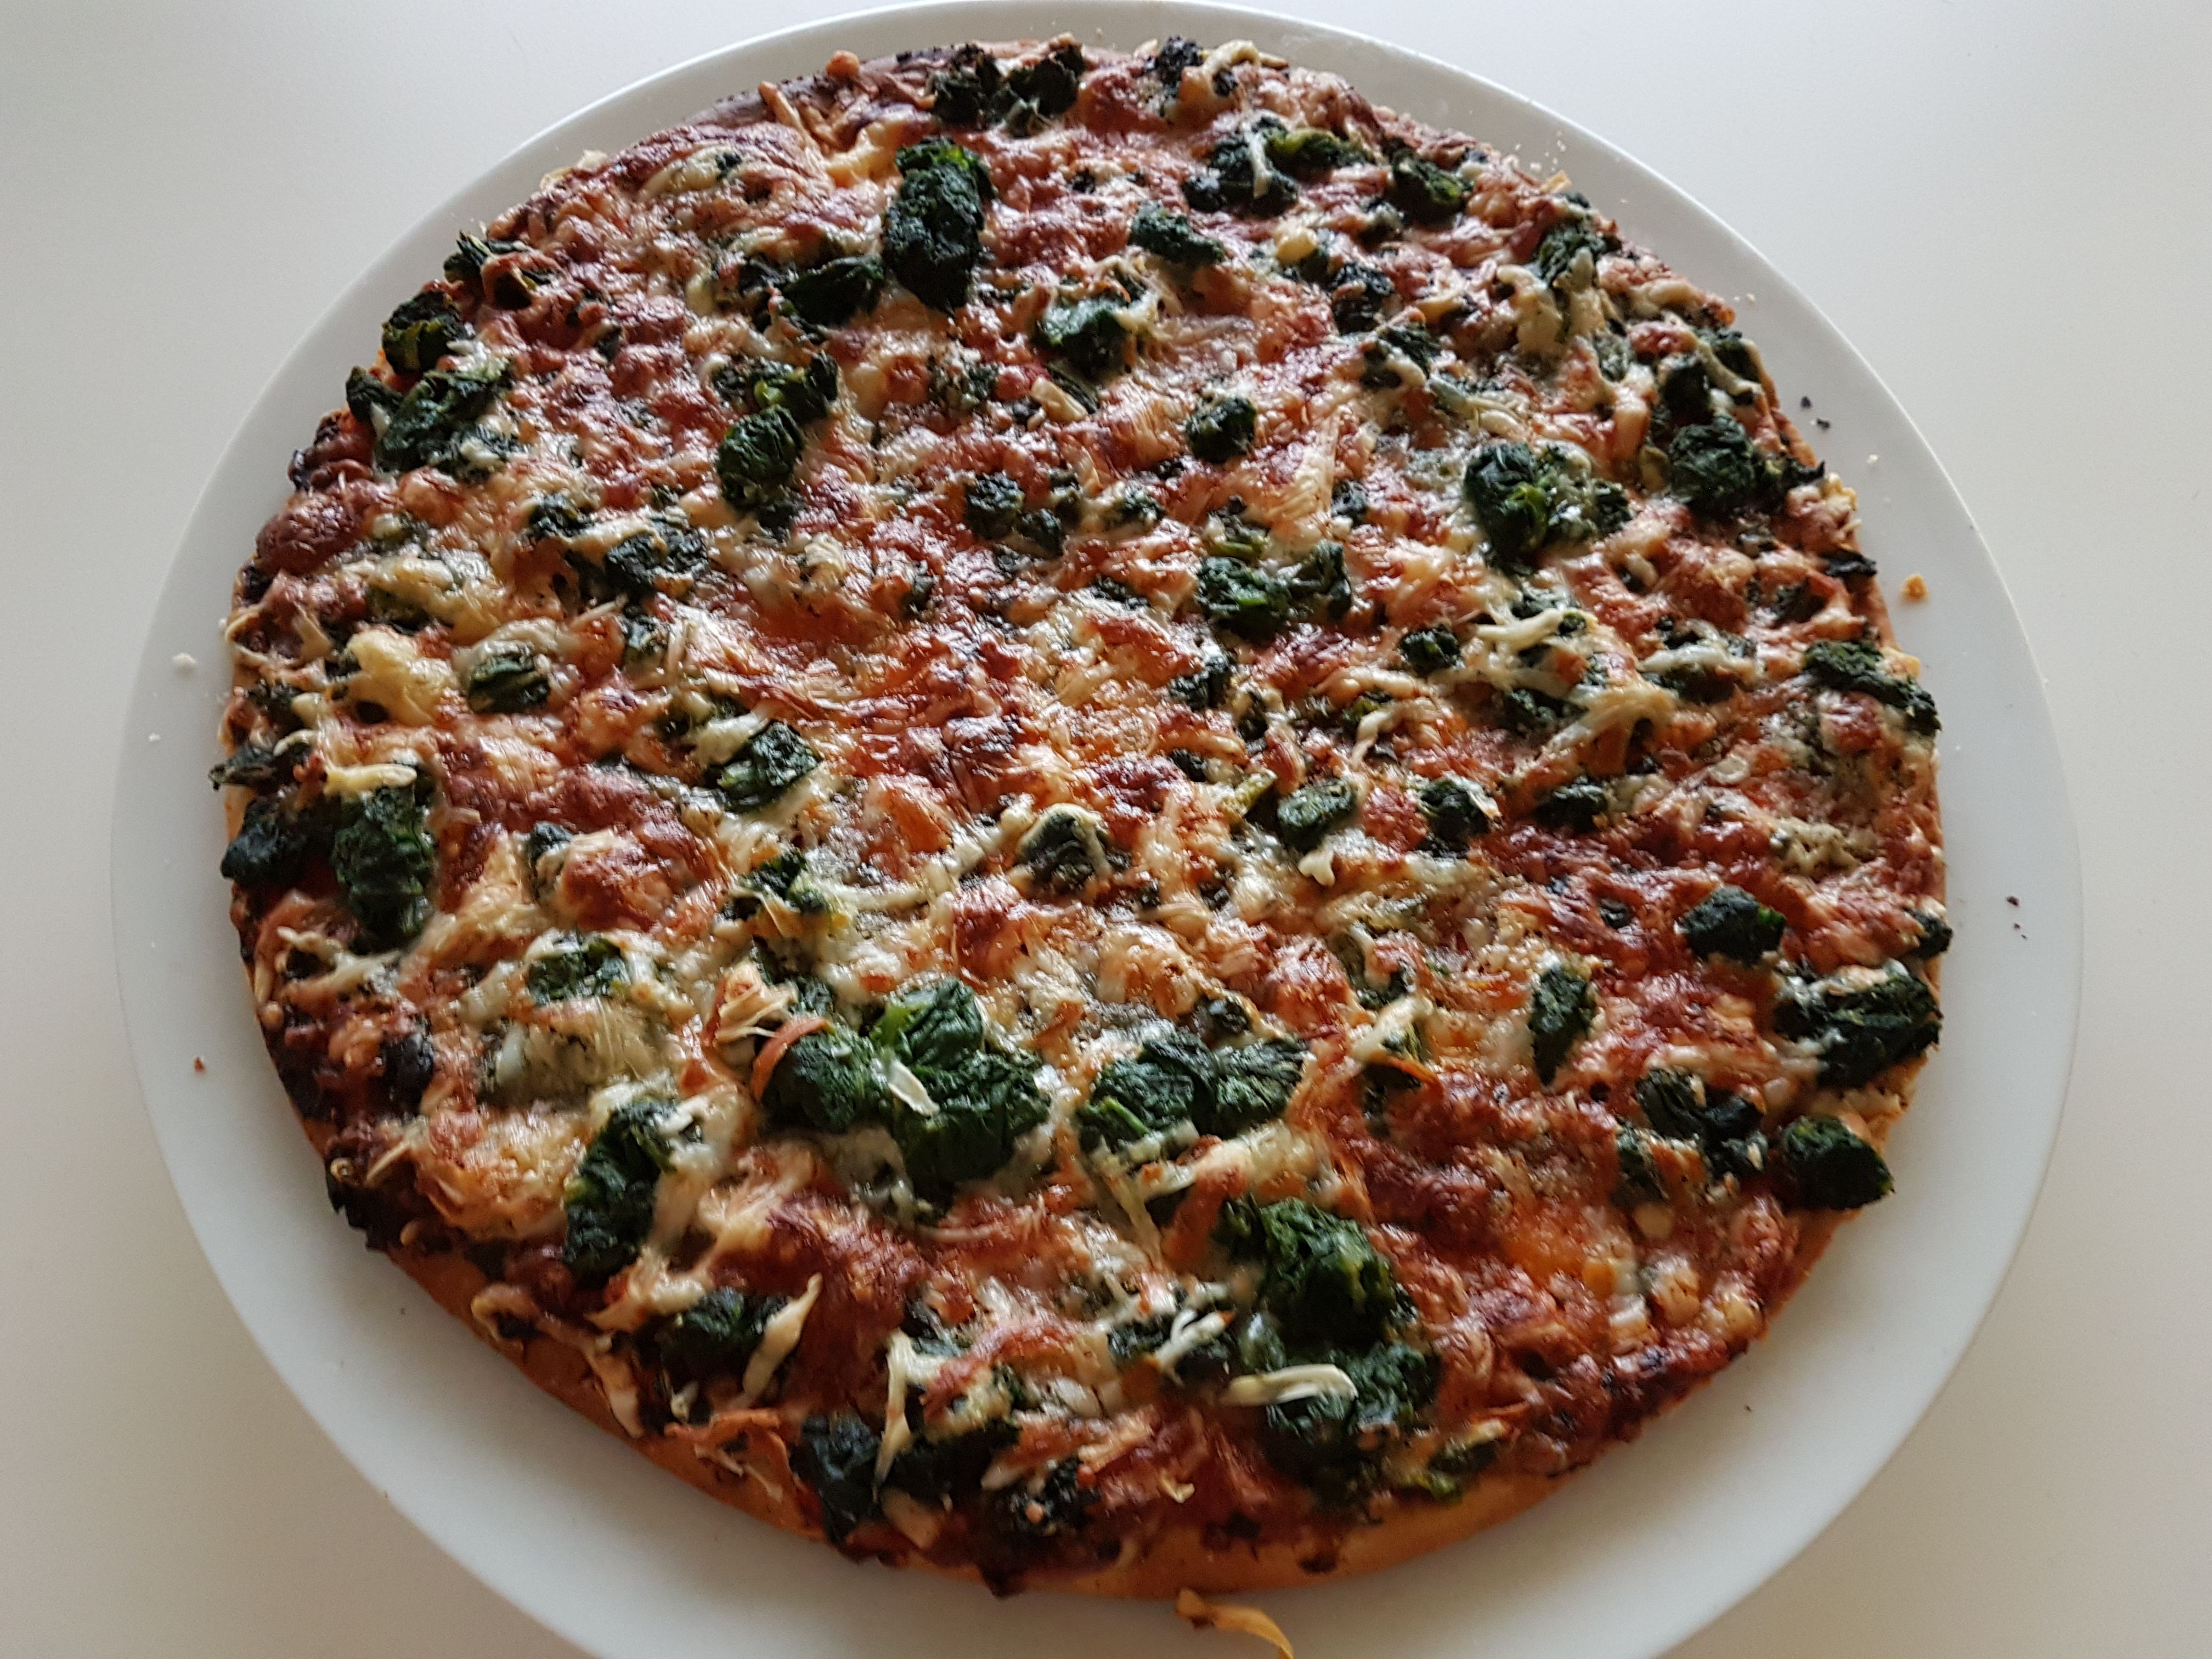 http://foodloader.net/Holz_2017-11-07_Pizza.jpg